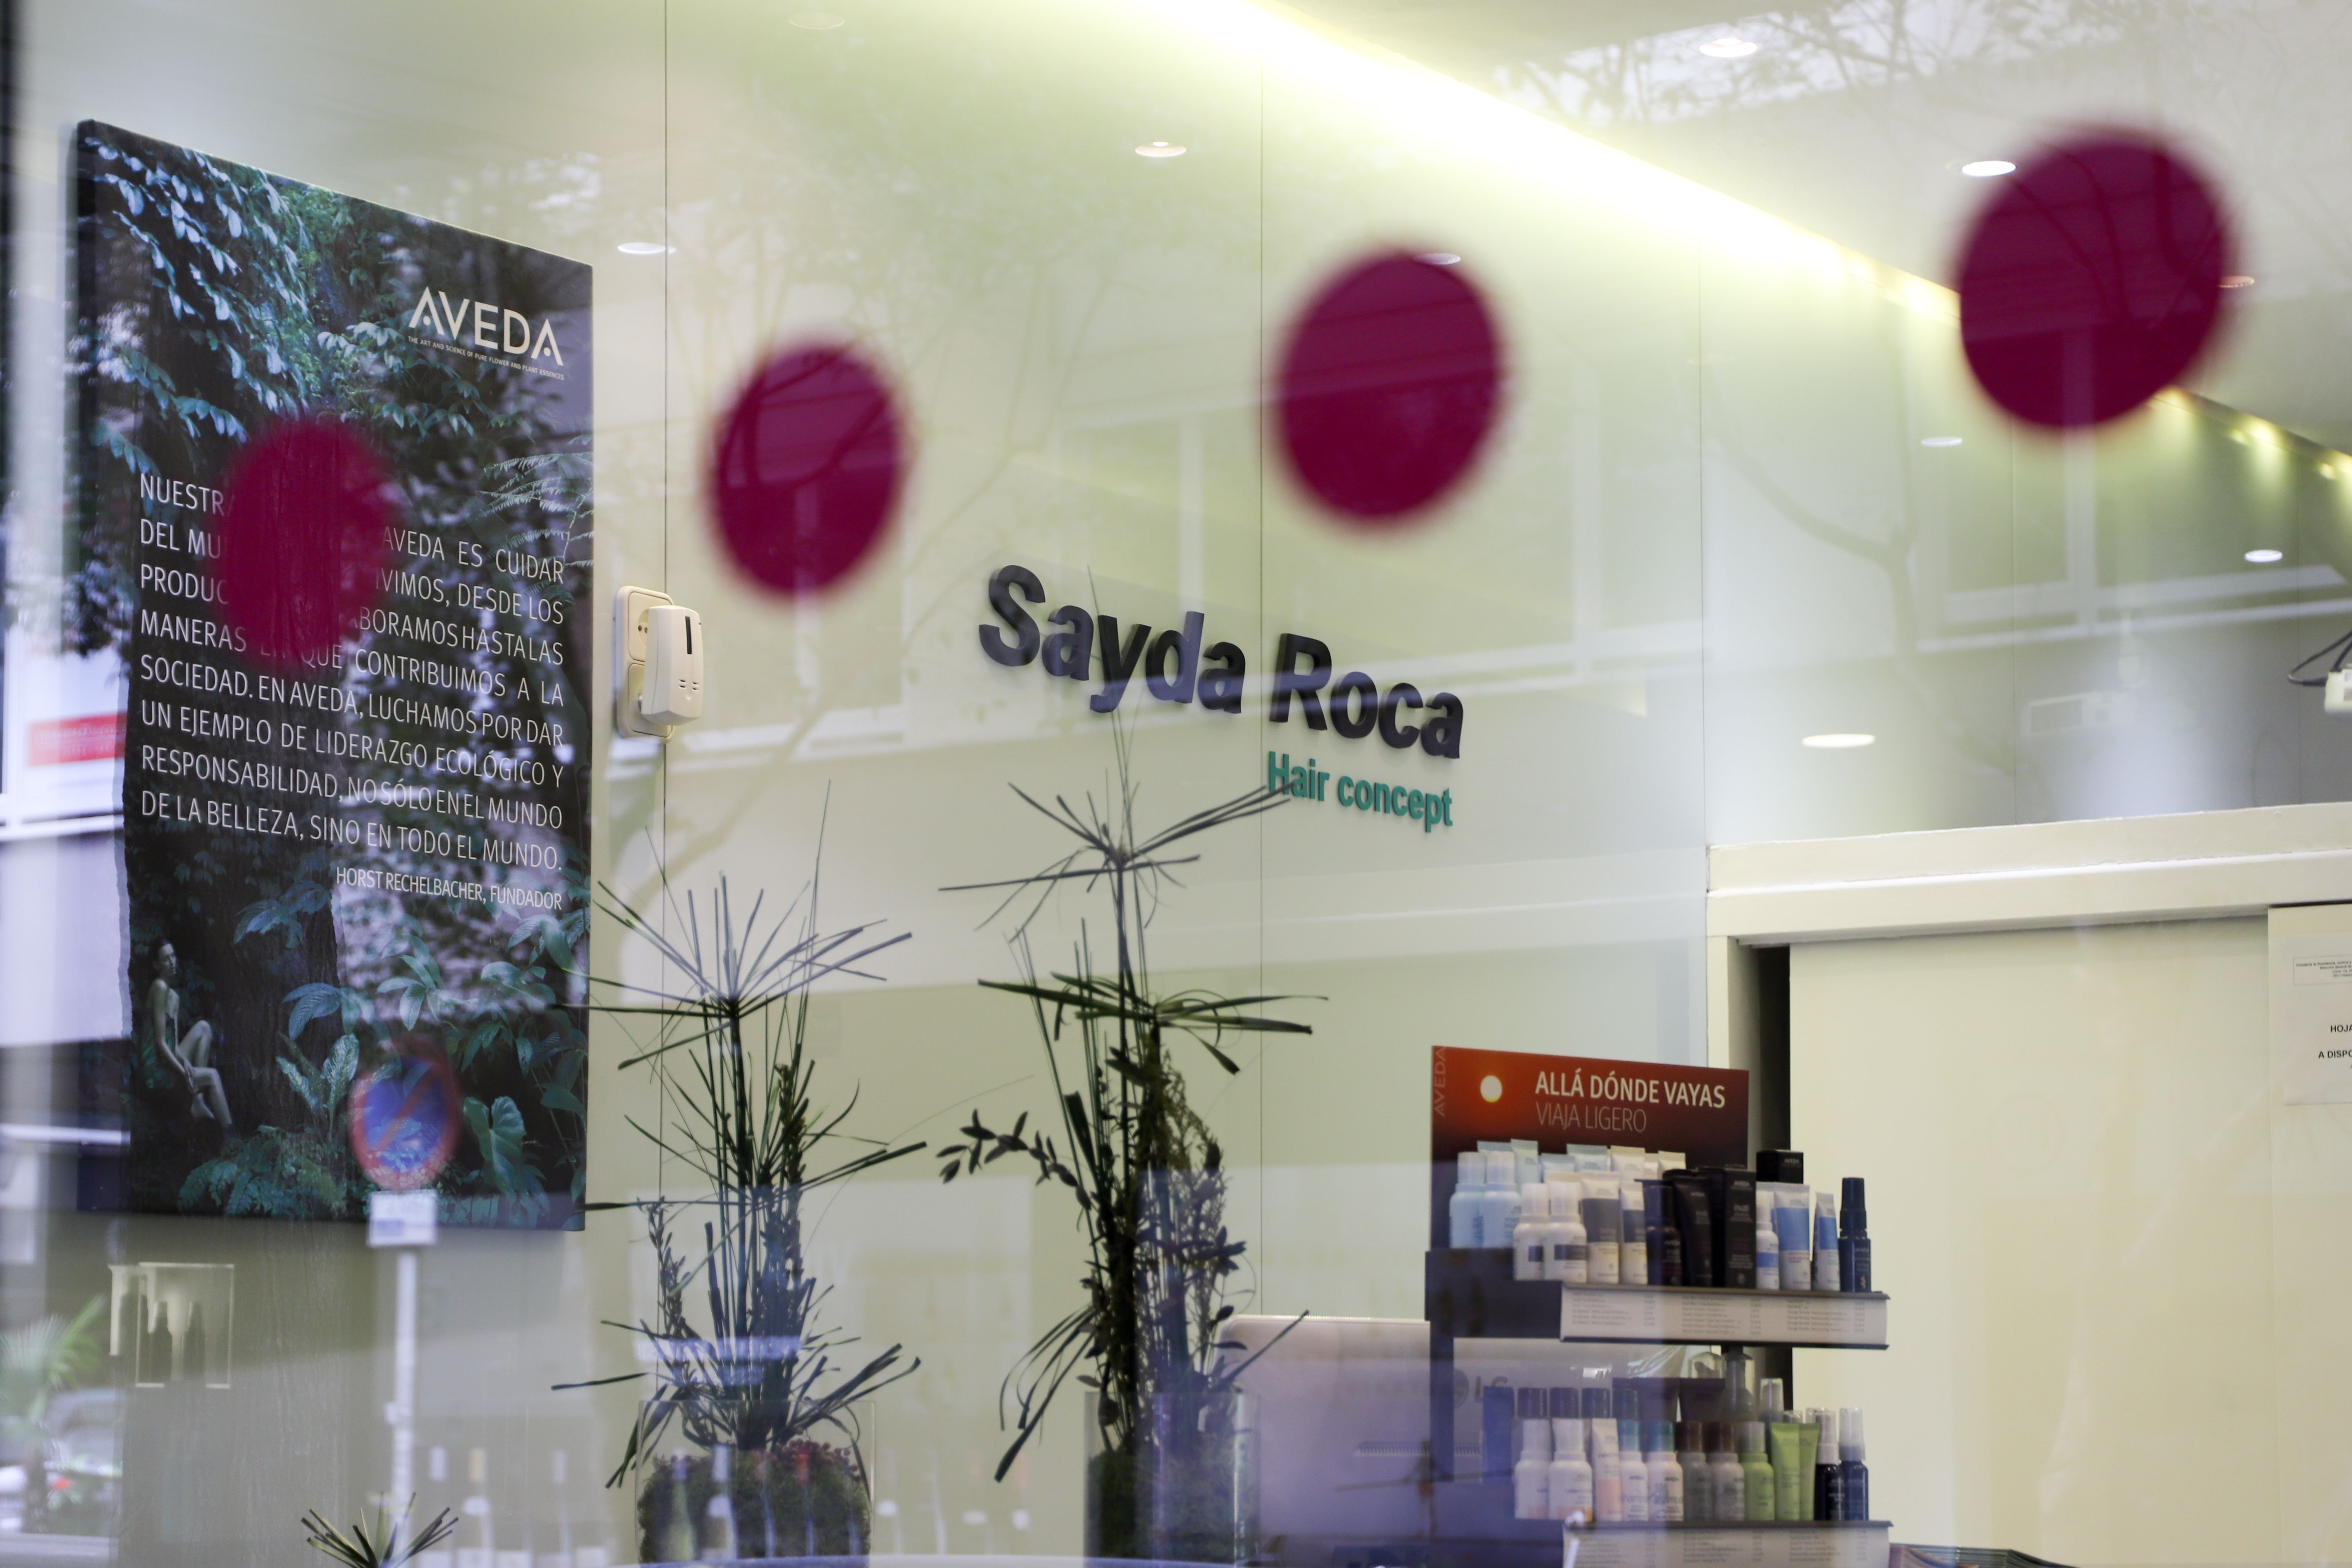 Sayda Roca